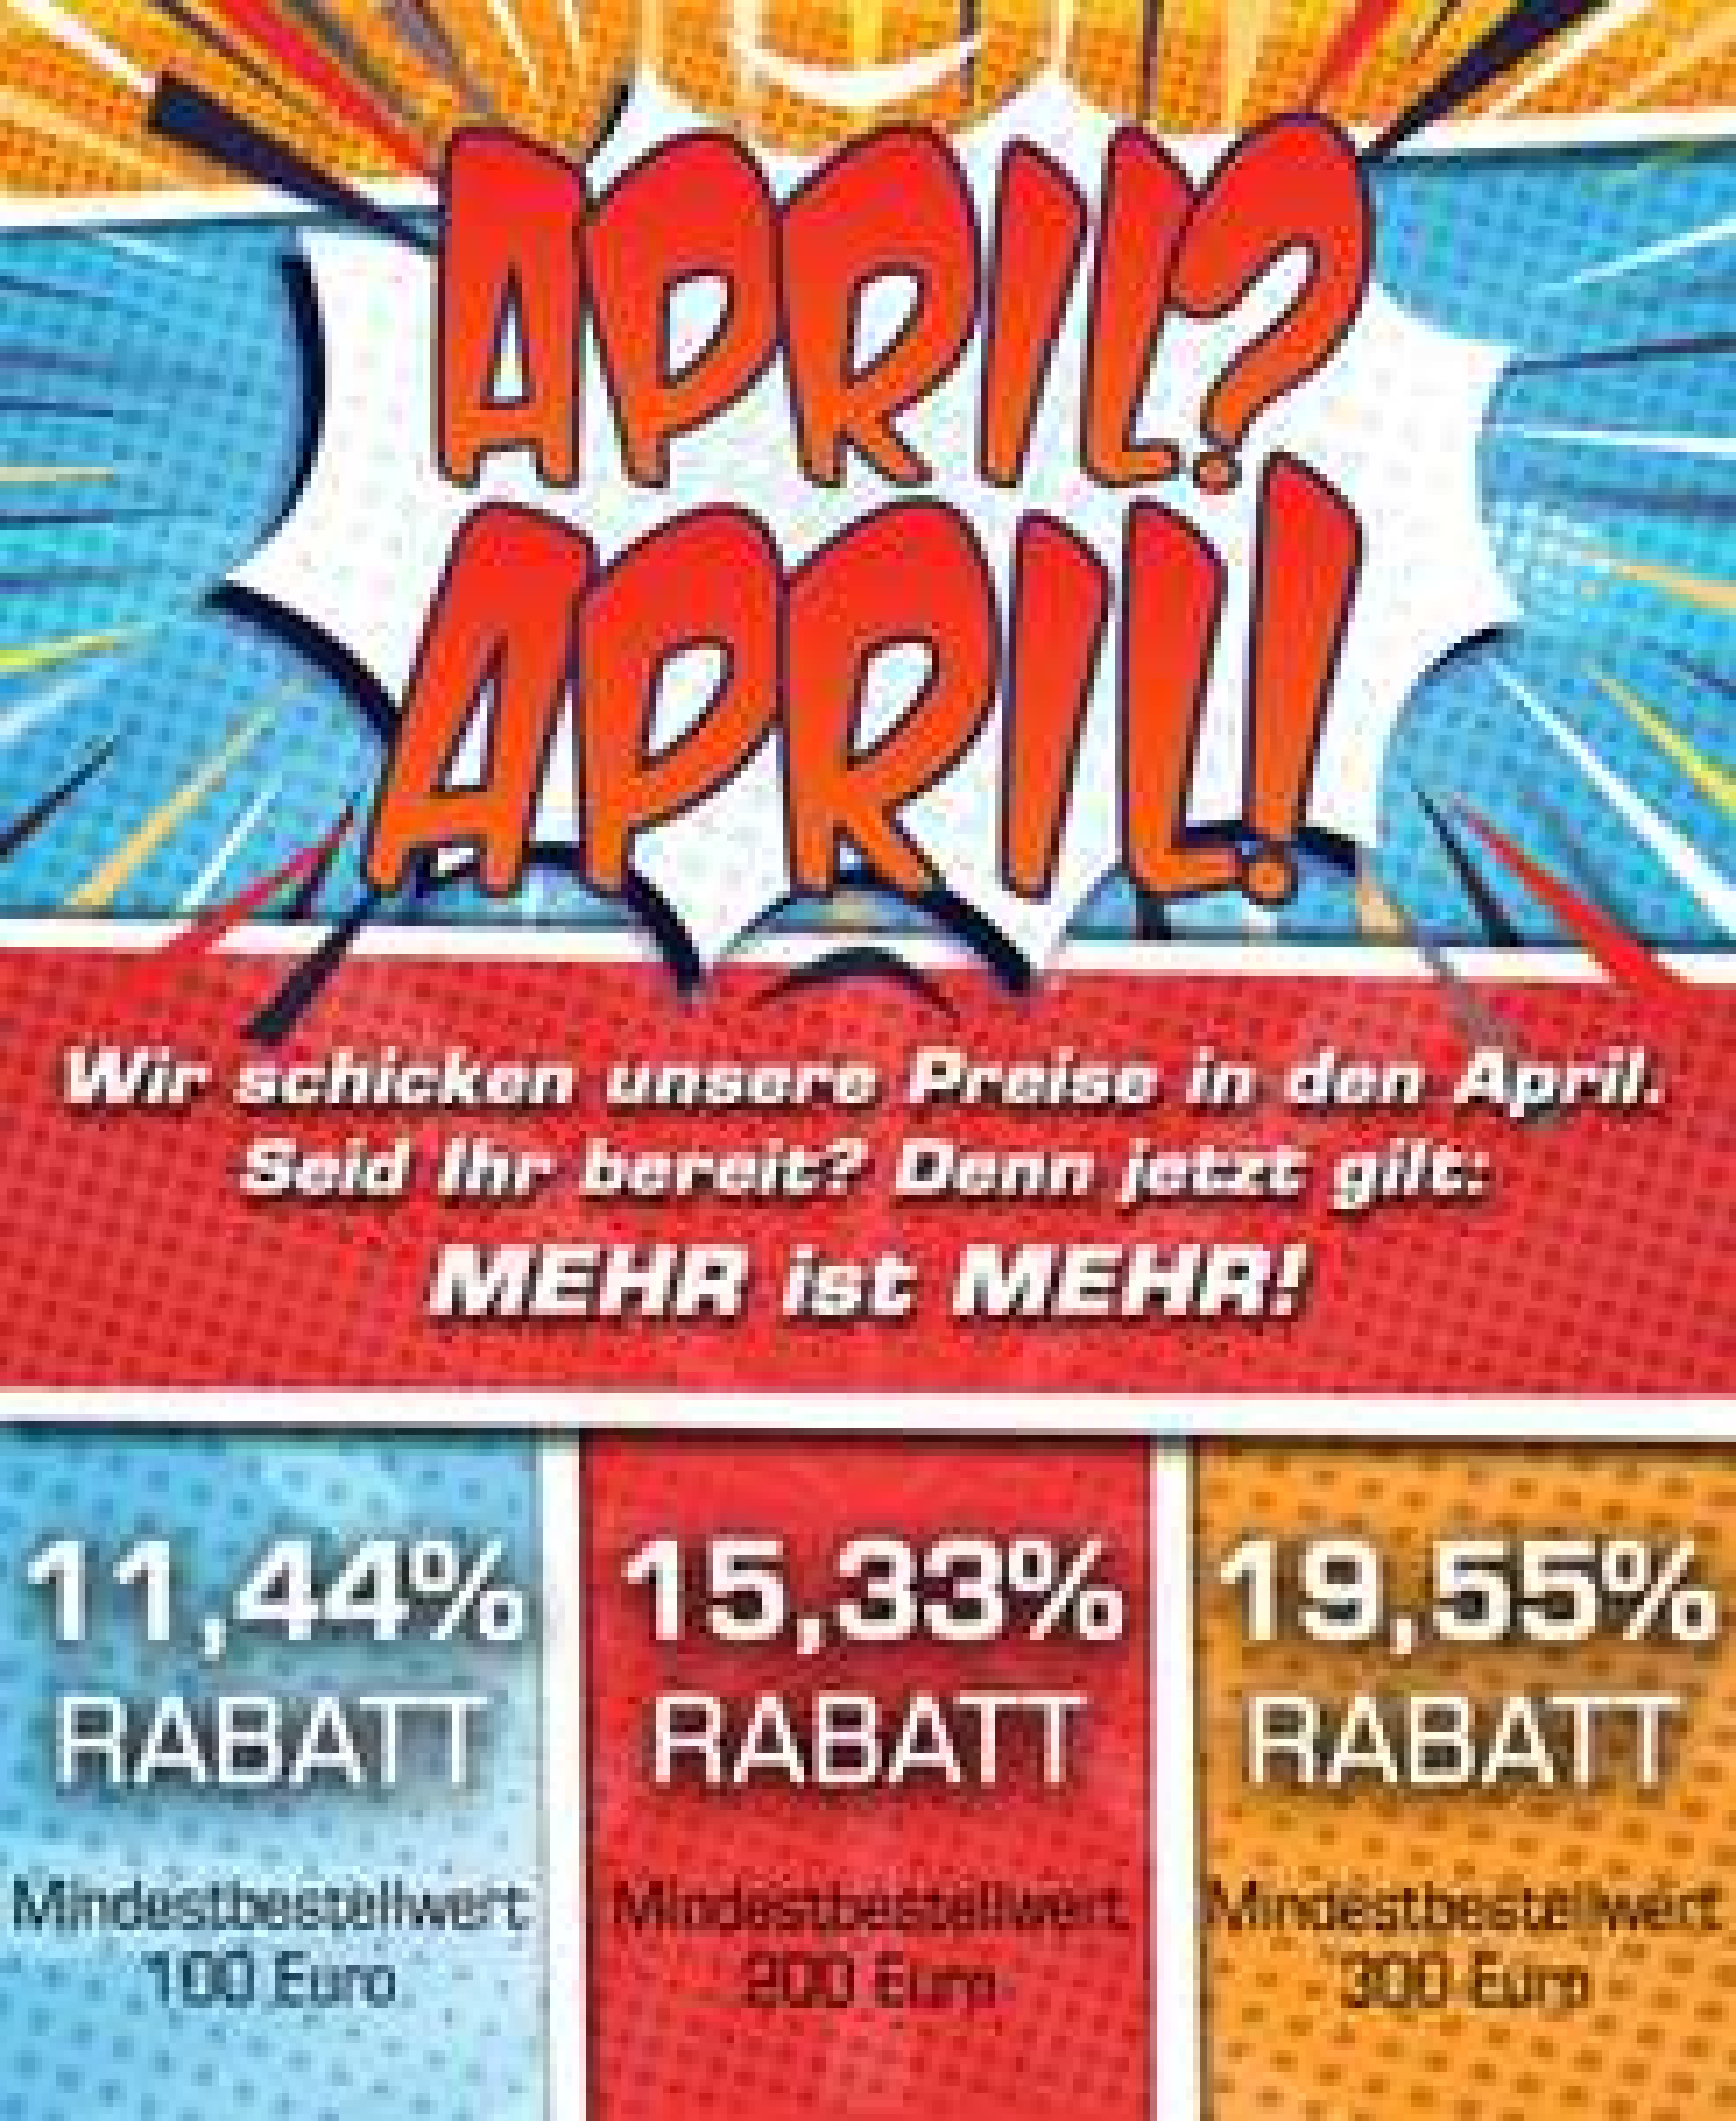 Bis zu 19,55% Rabatt heute - nur 1. April